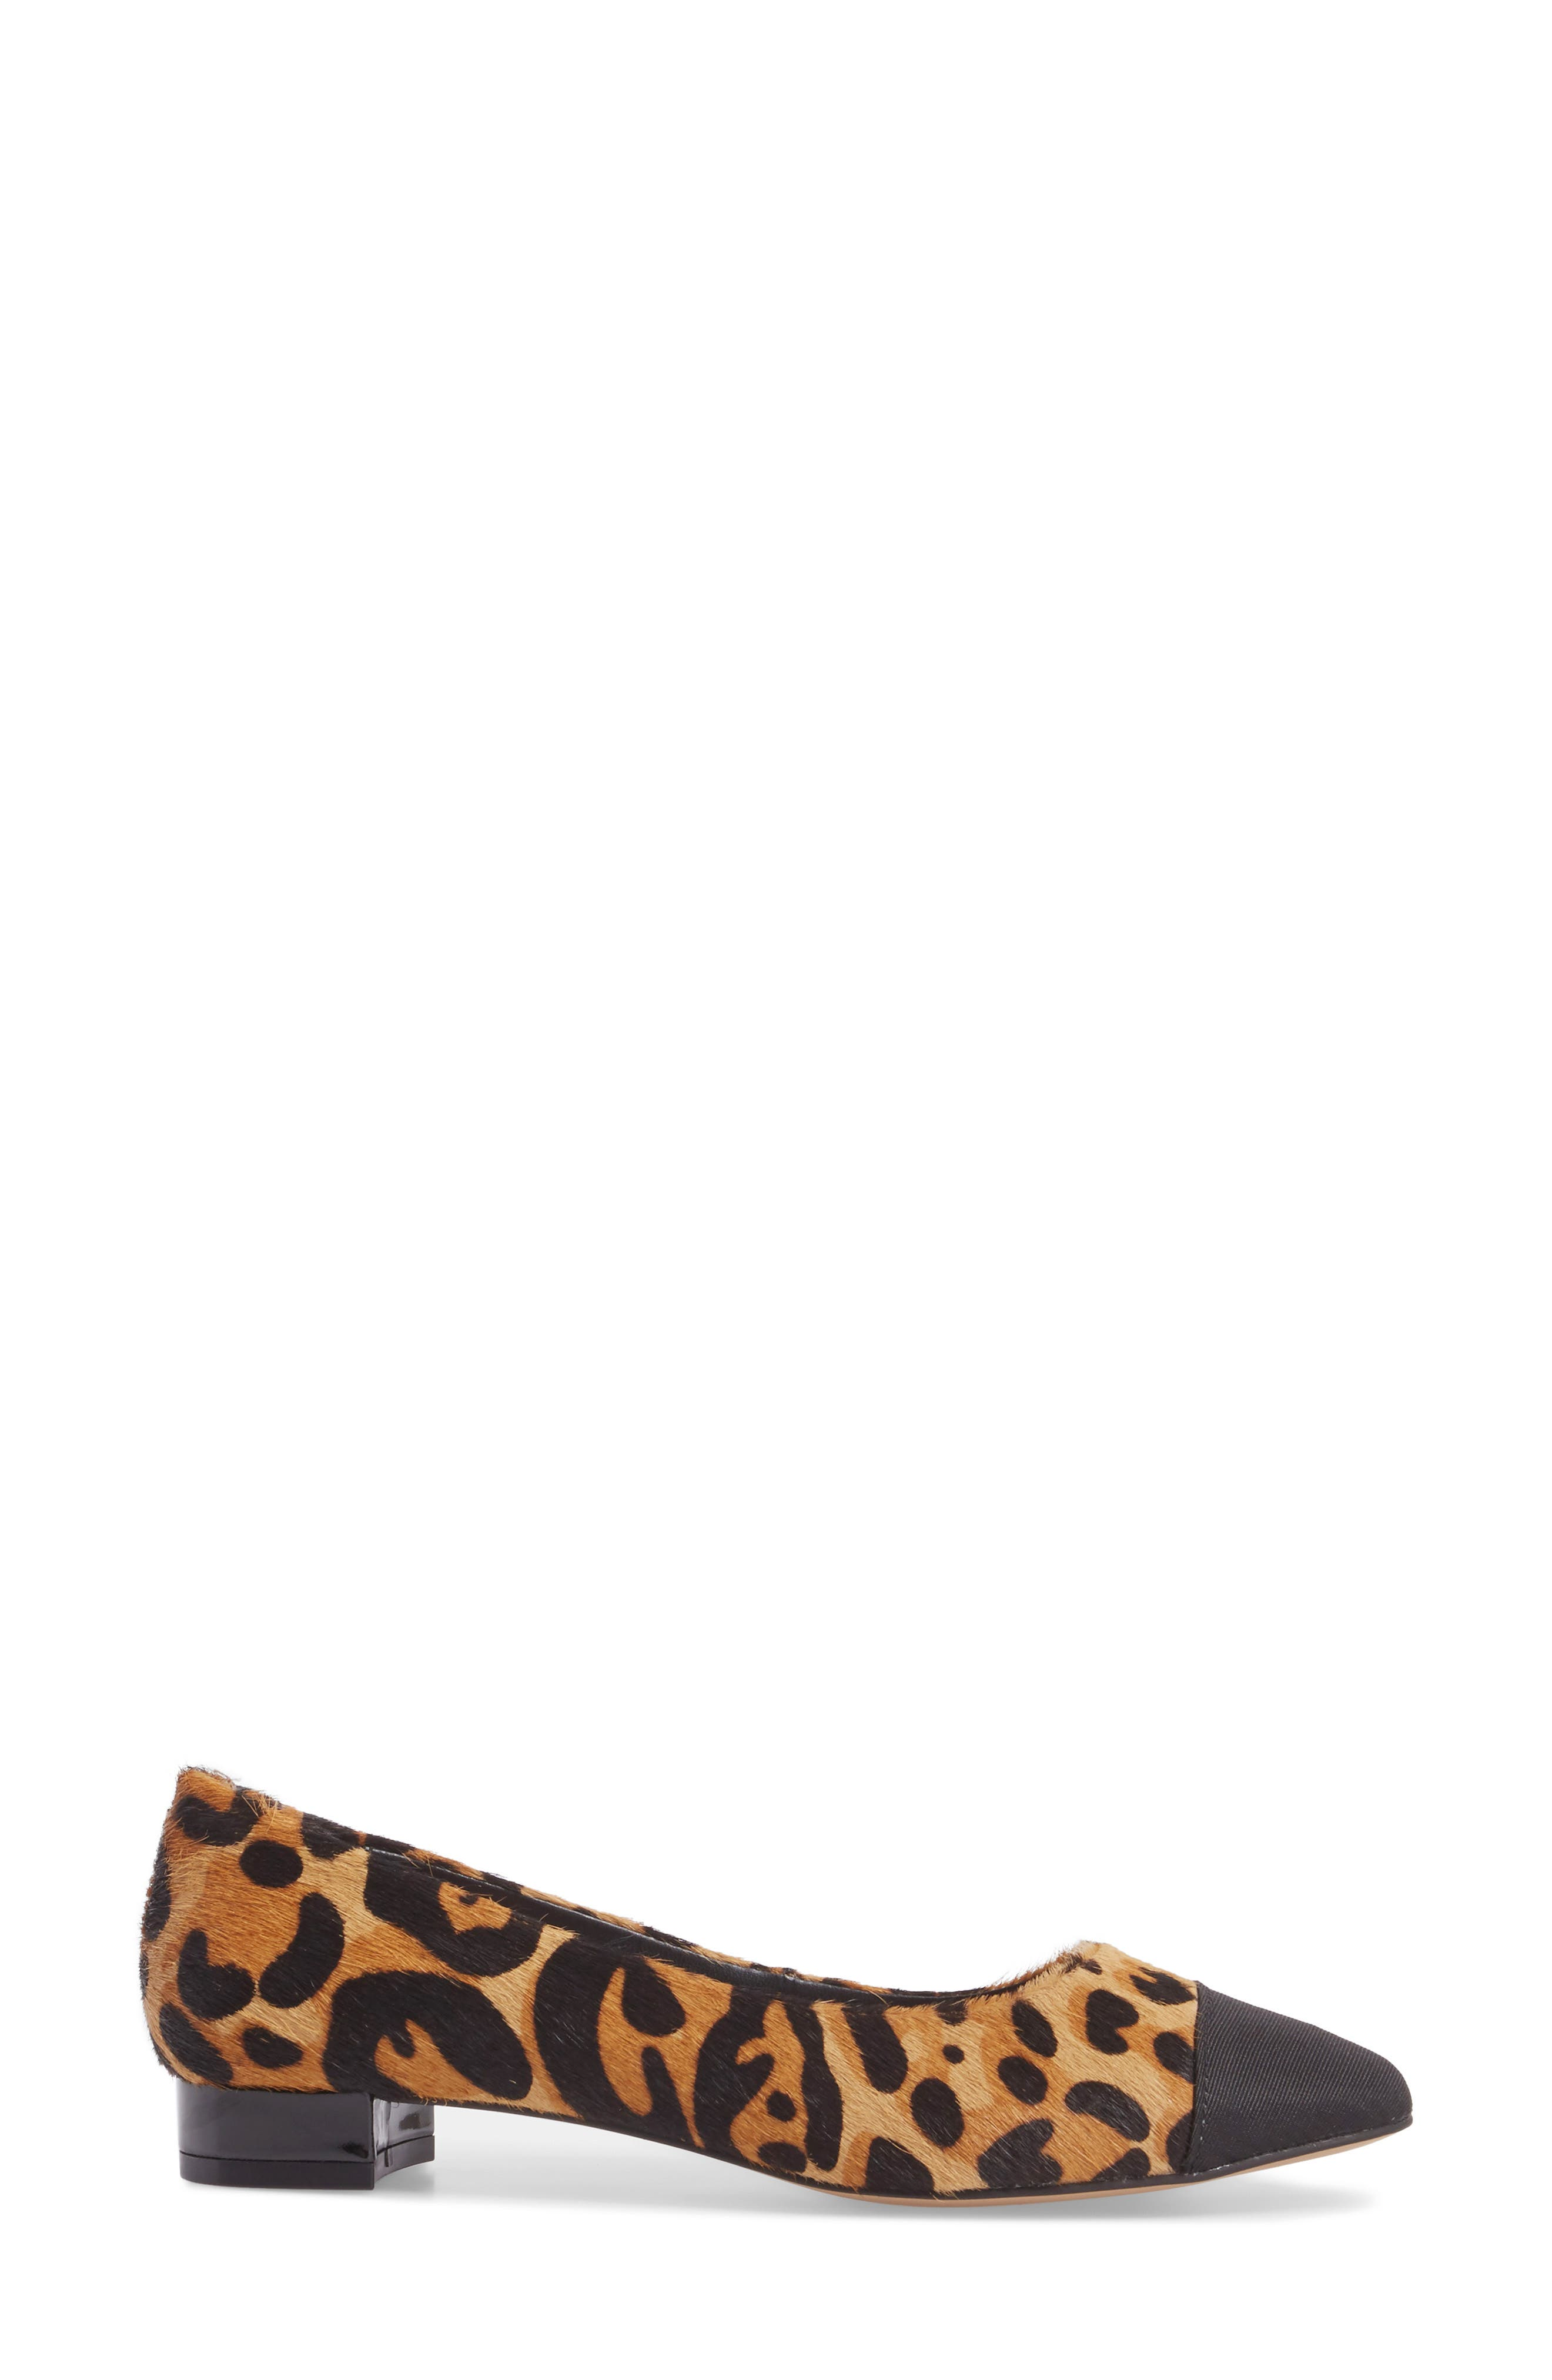 Brea Flat,                             Alternate thumbnail 3, color,                             Leopard Calf Hair